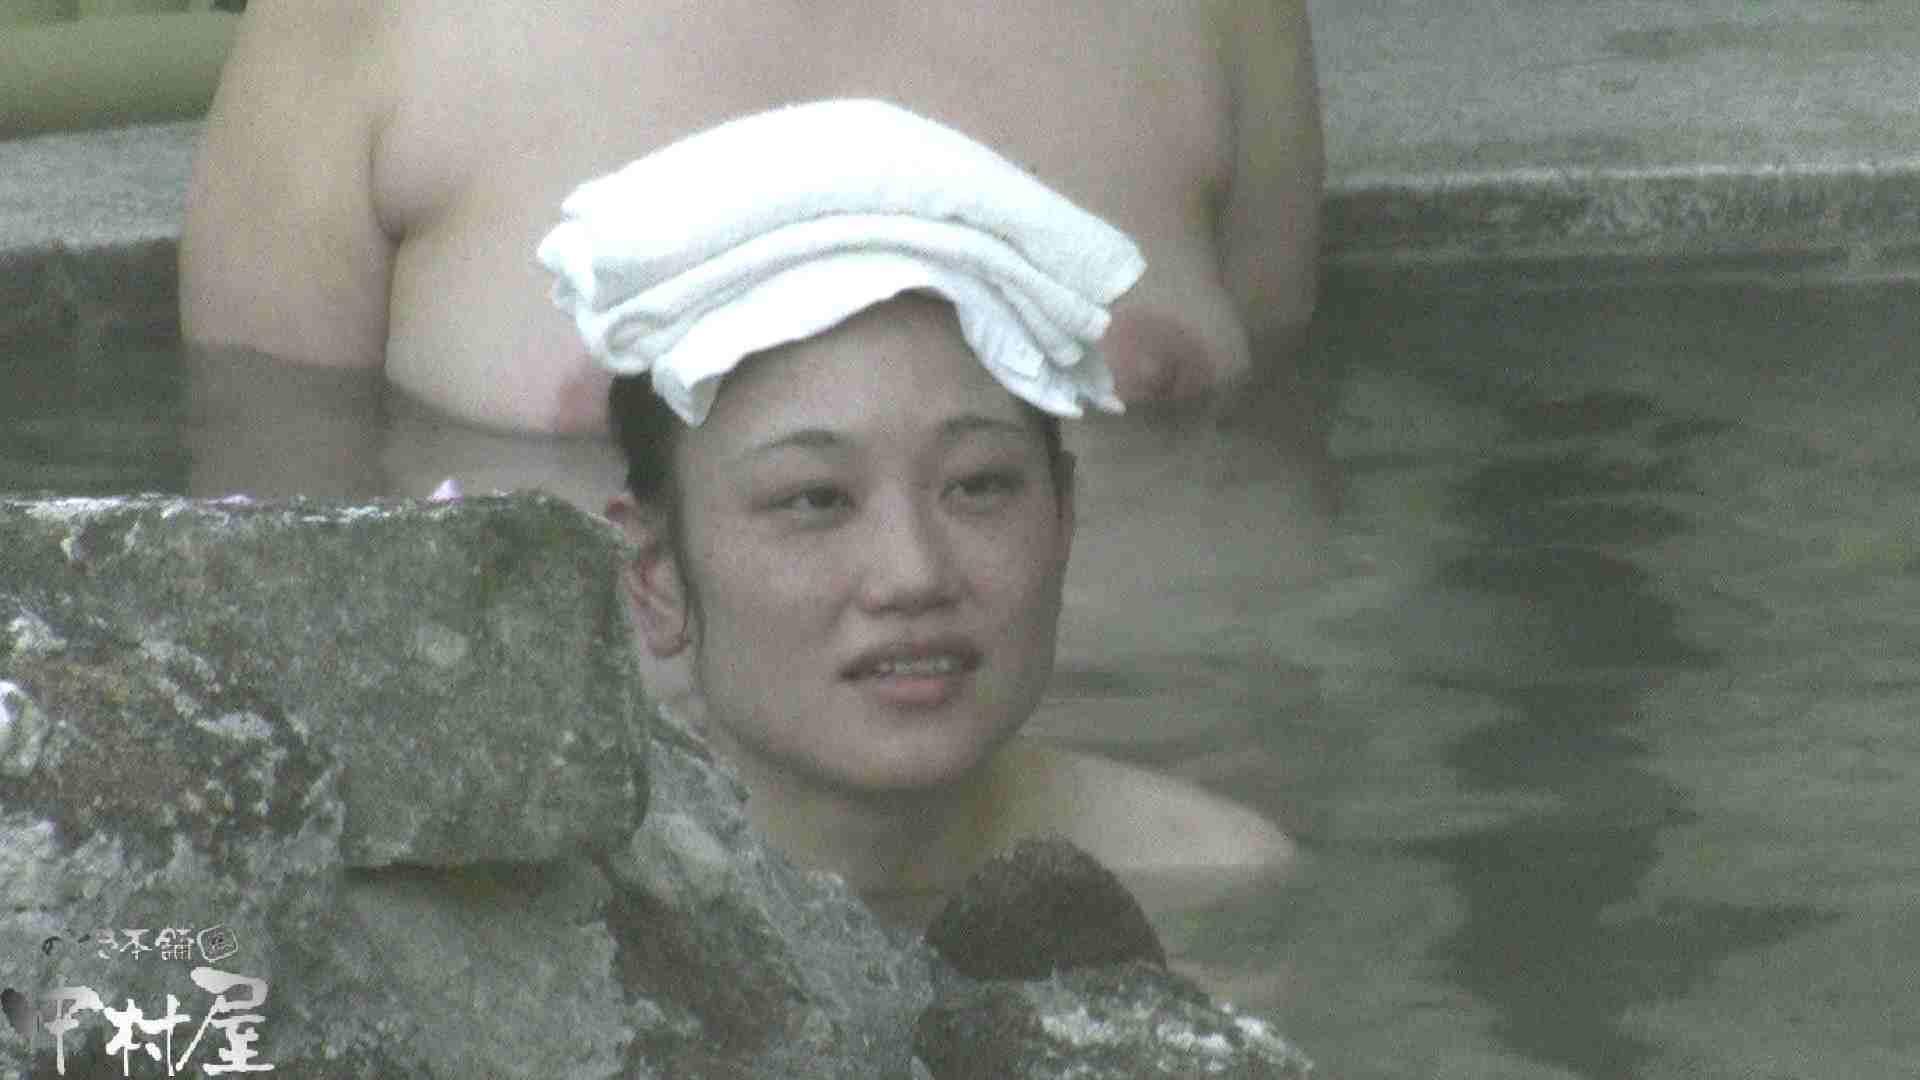 Aquaな露天風呂Vol.914 露天風呂編  83PIX 34